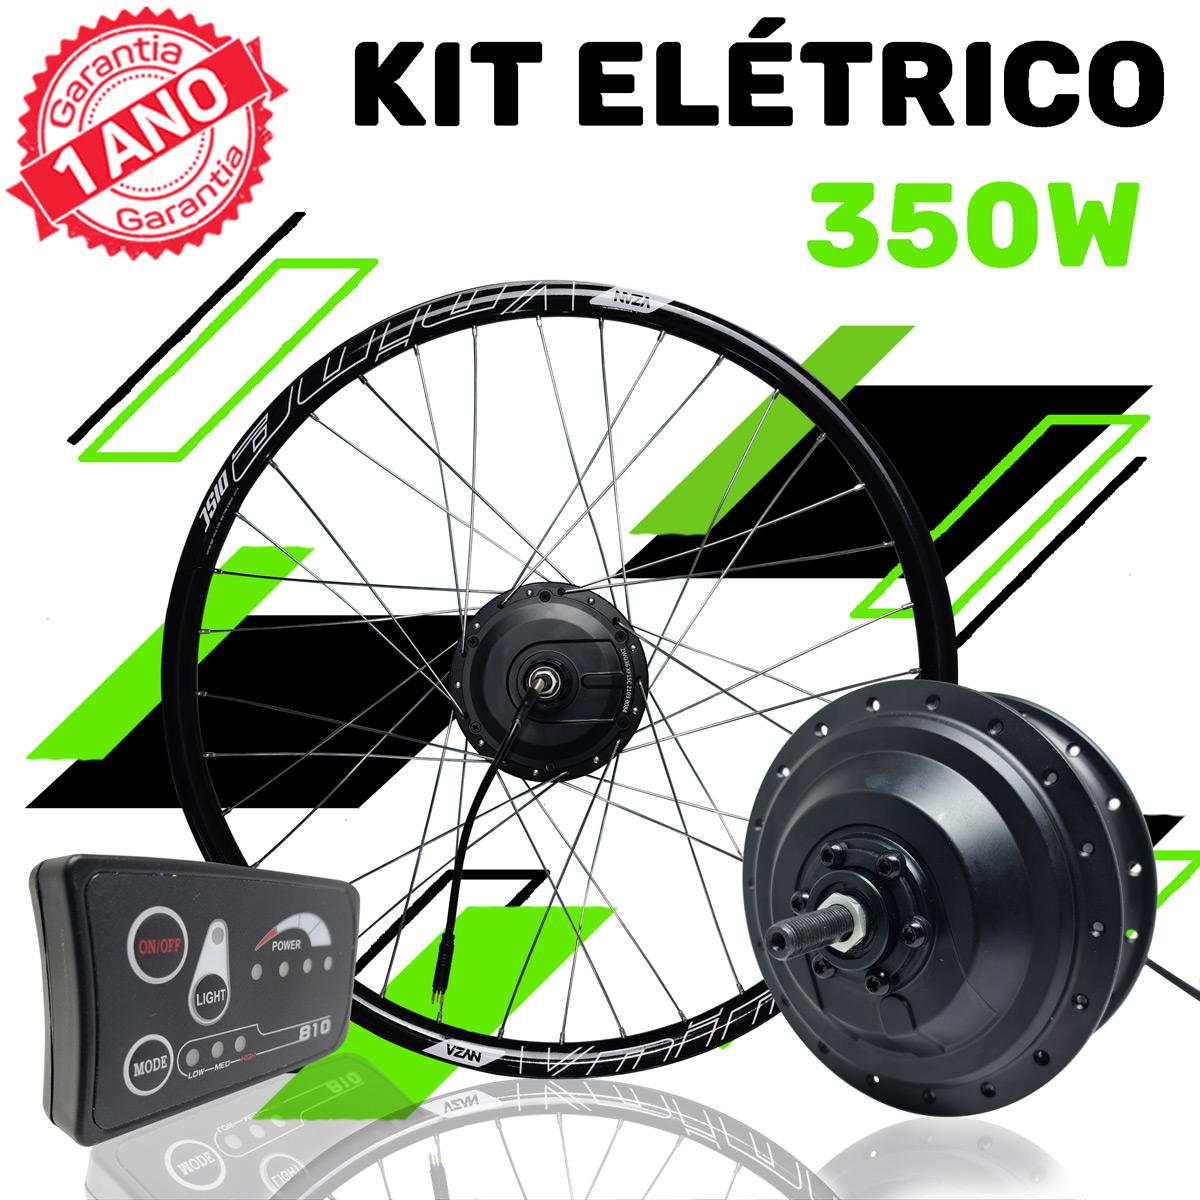 Kit Elétrico para Bicicleta - TecBike - 350 Watts 36V - Aro 20